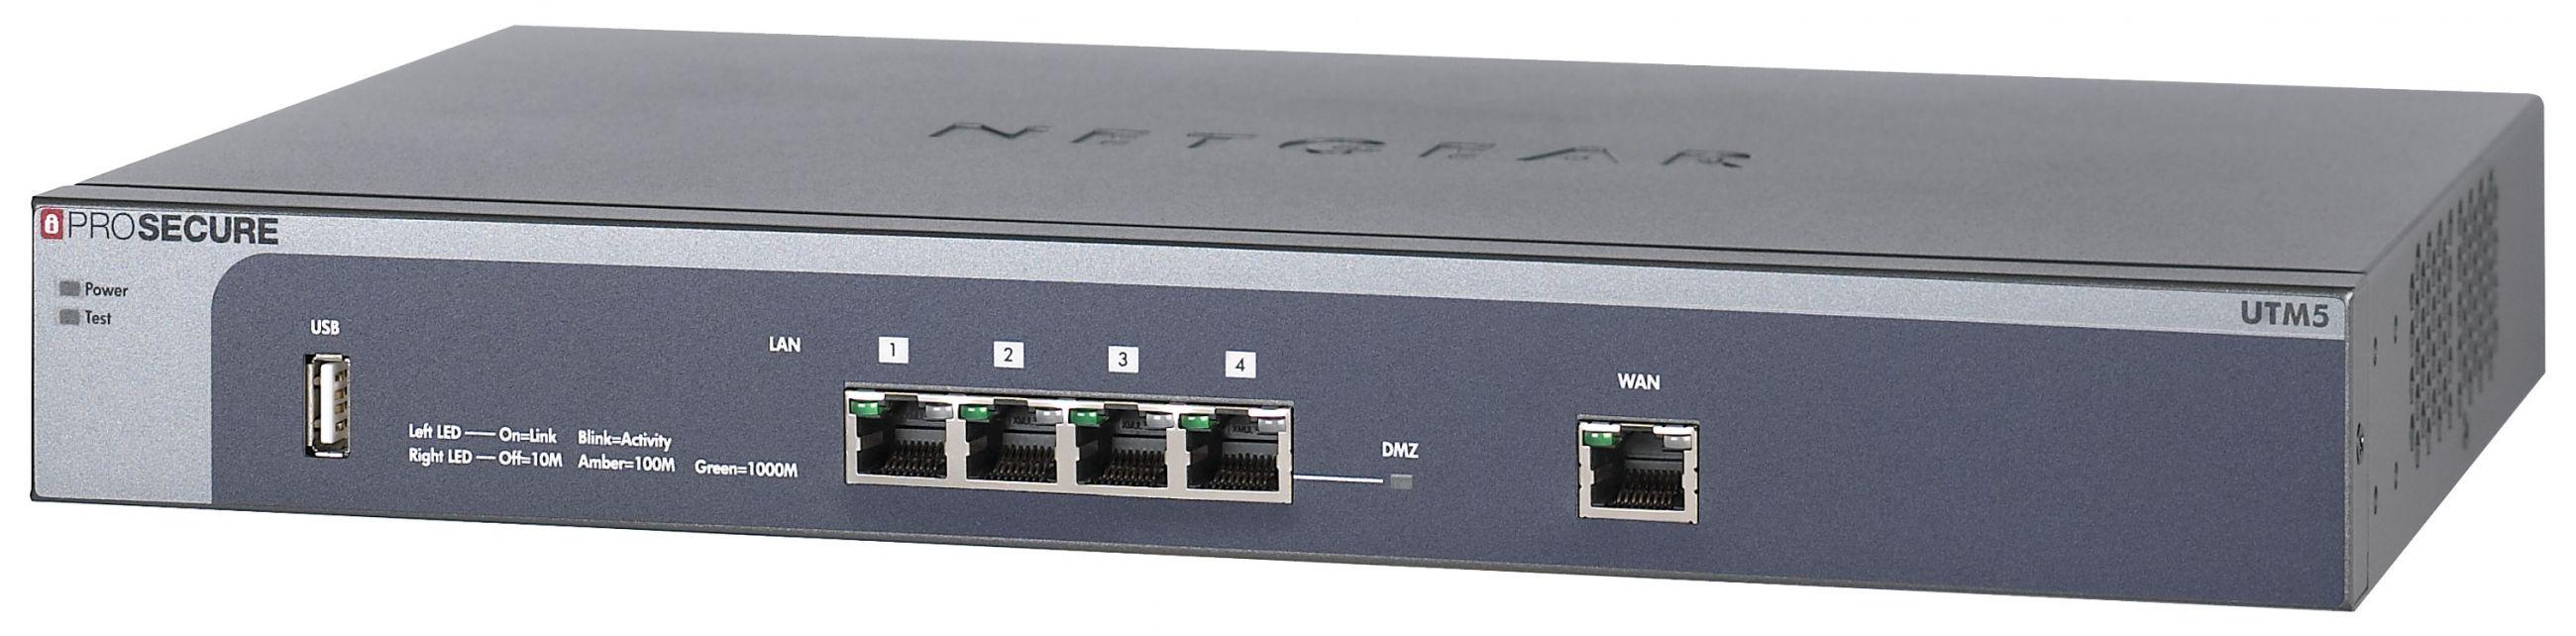 ProSecure unified threat management (UTM) appliance - UTM5